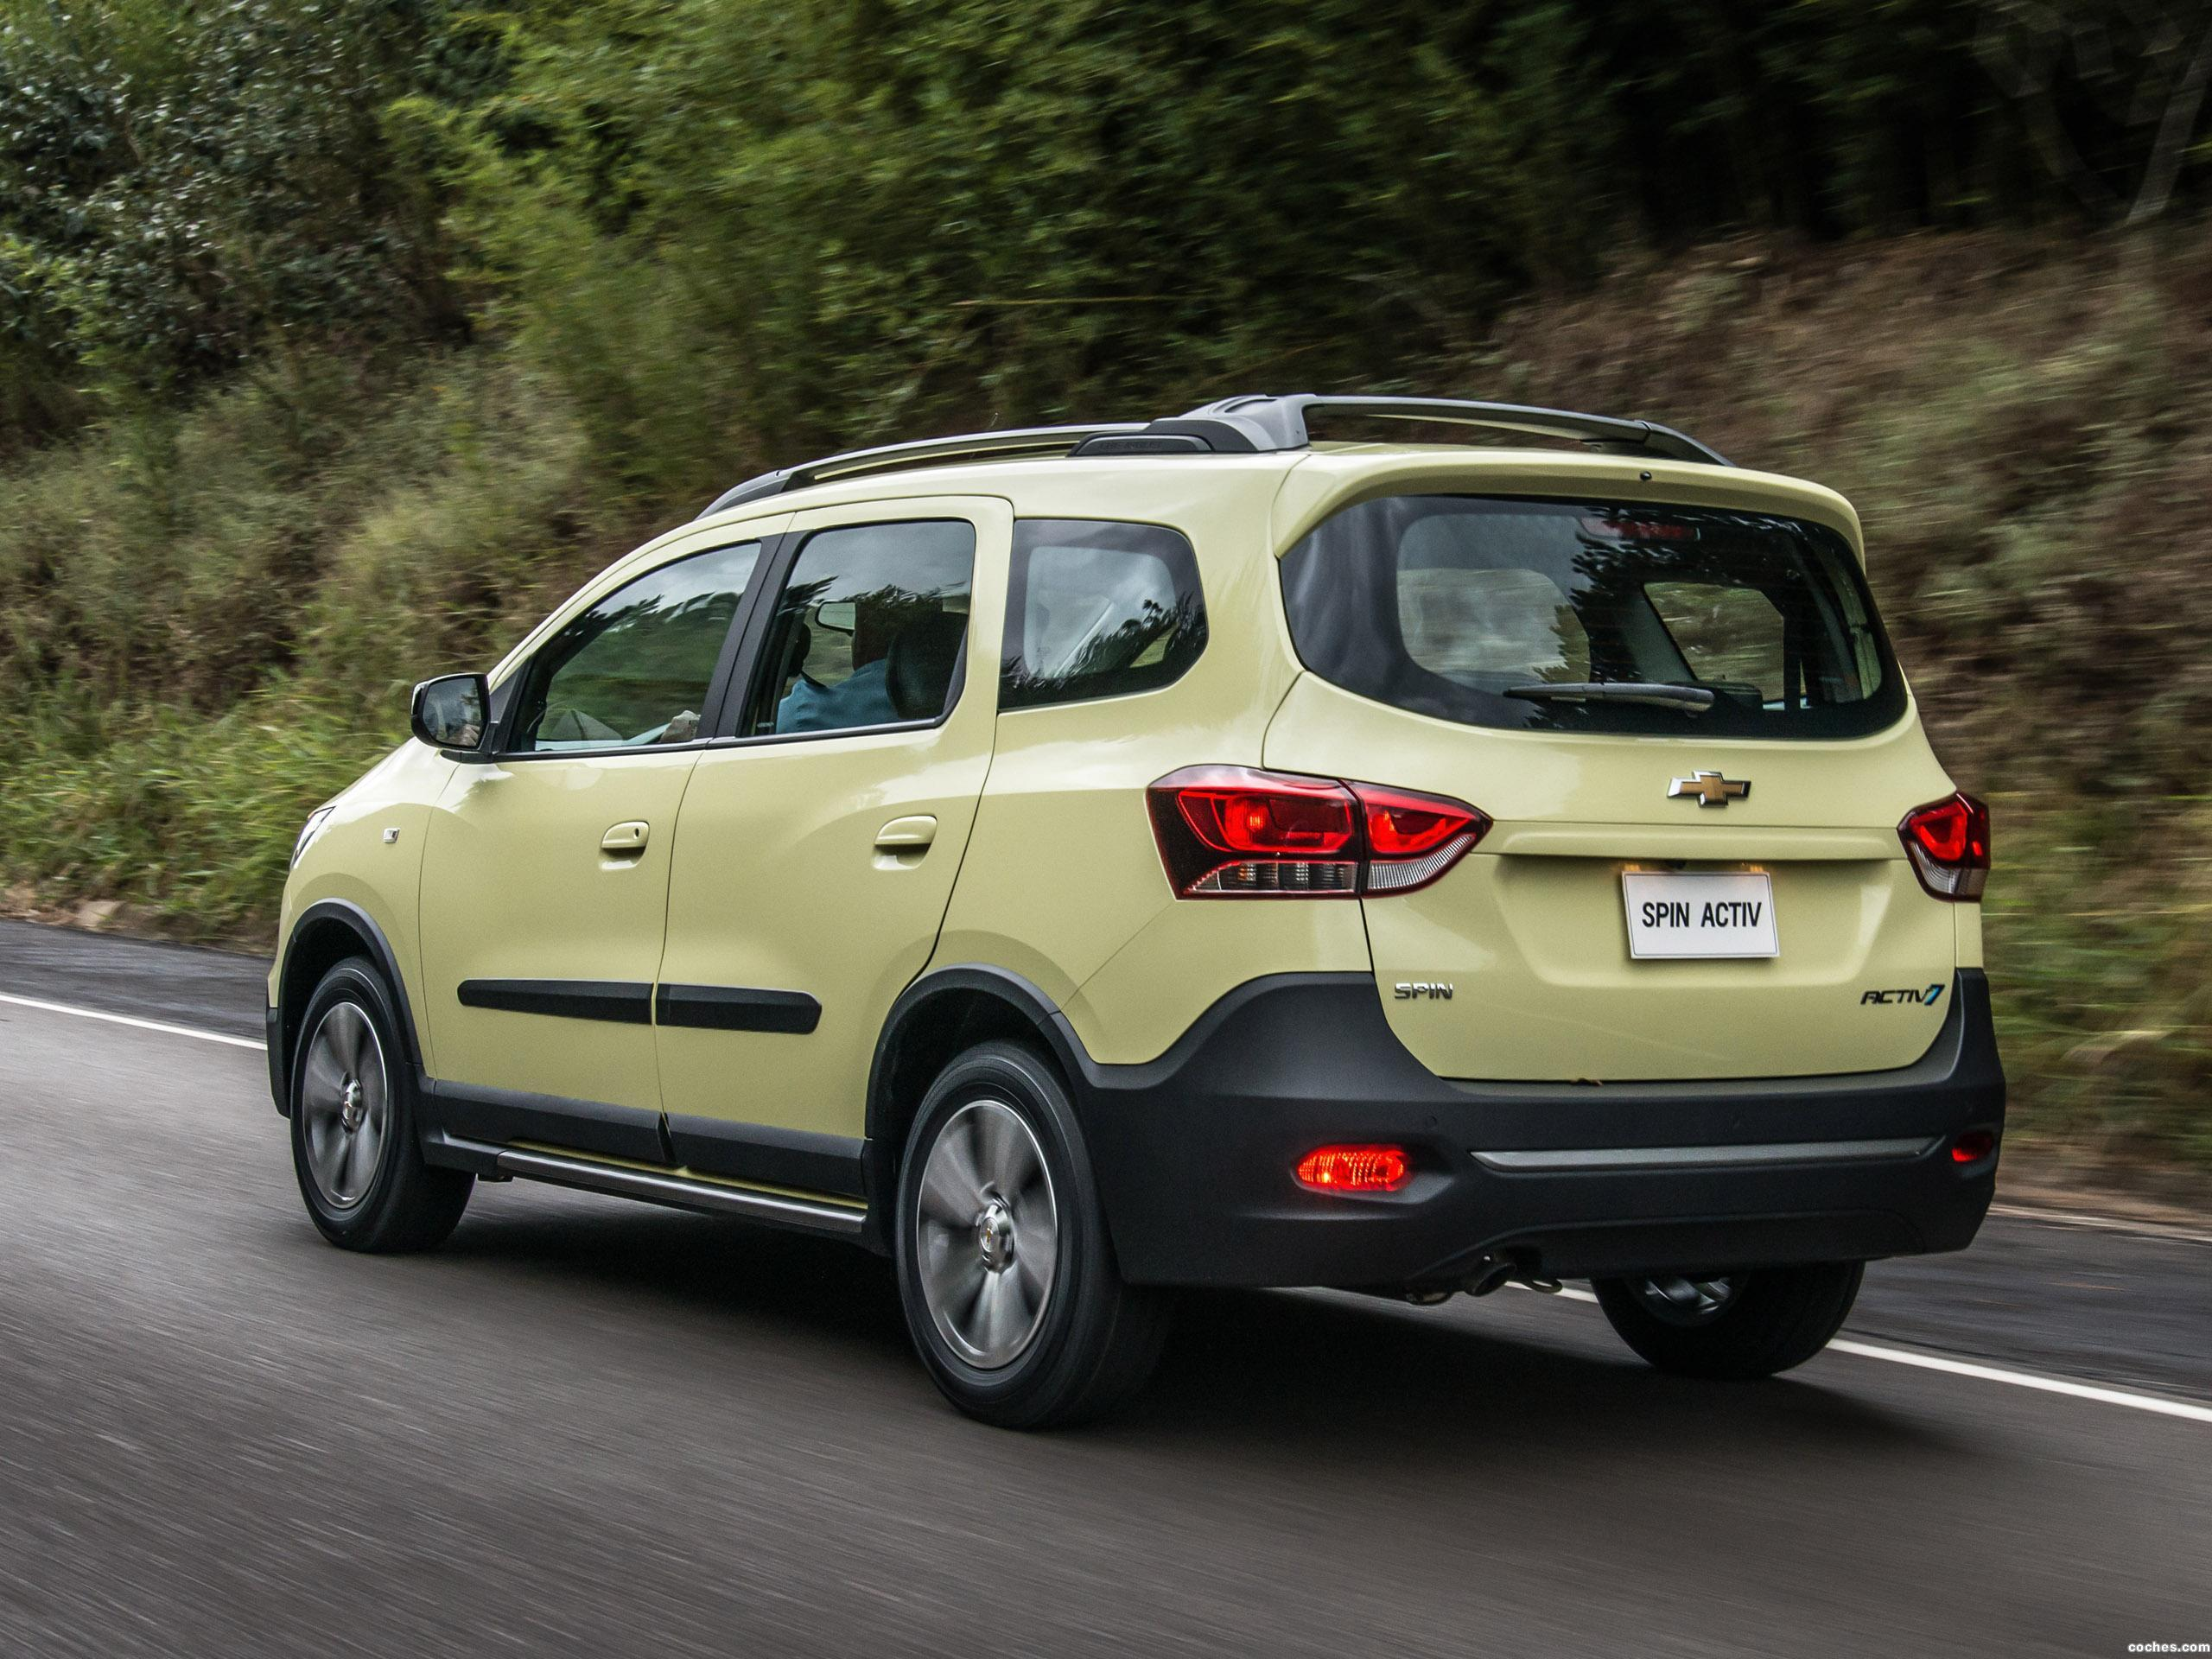 Foto 6 de Chevrolet Spin Activ 2018